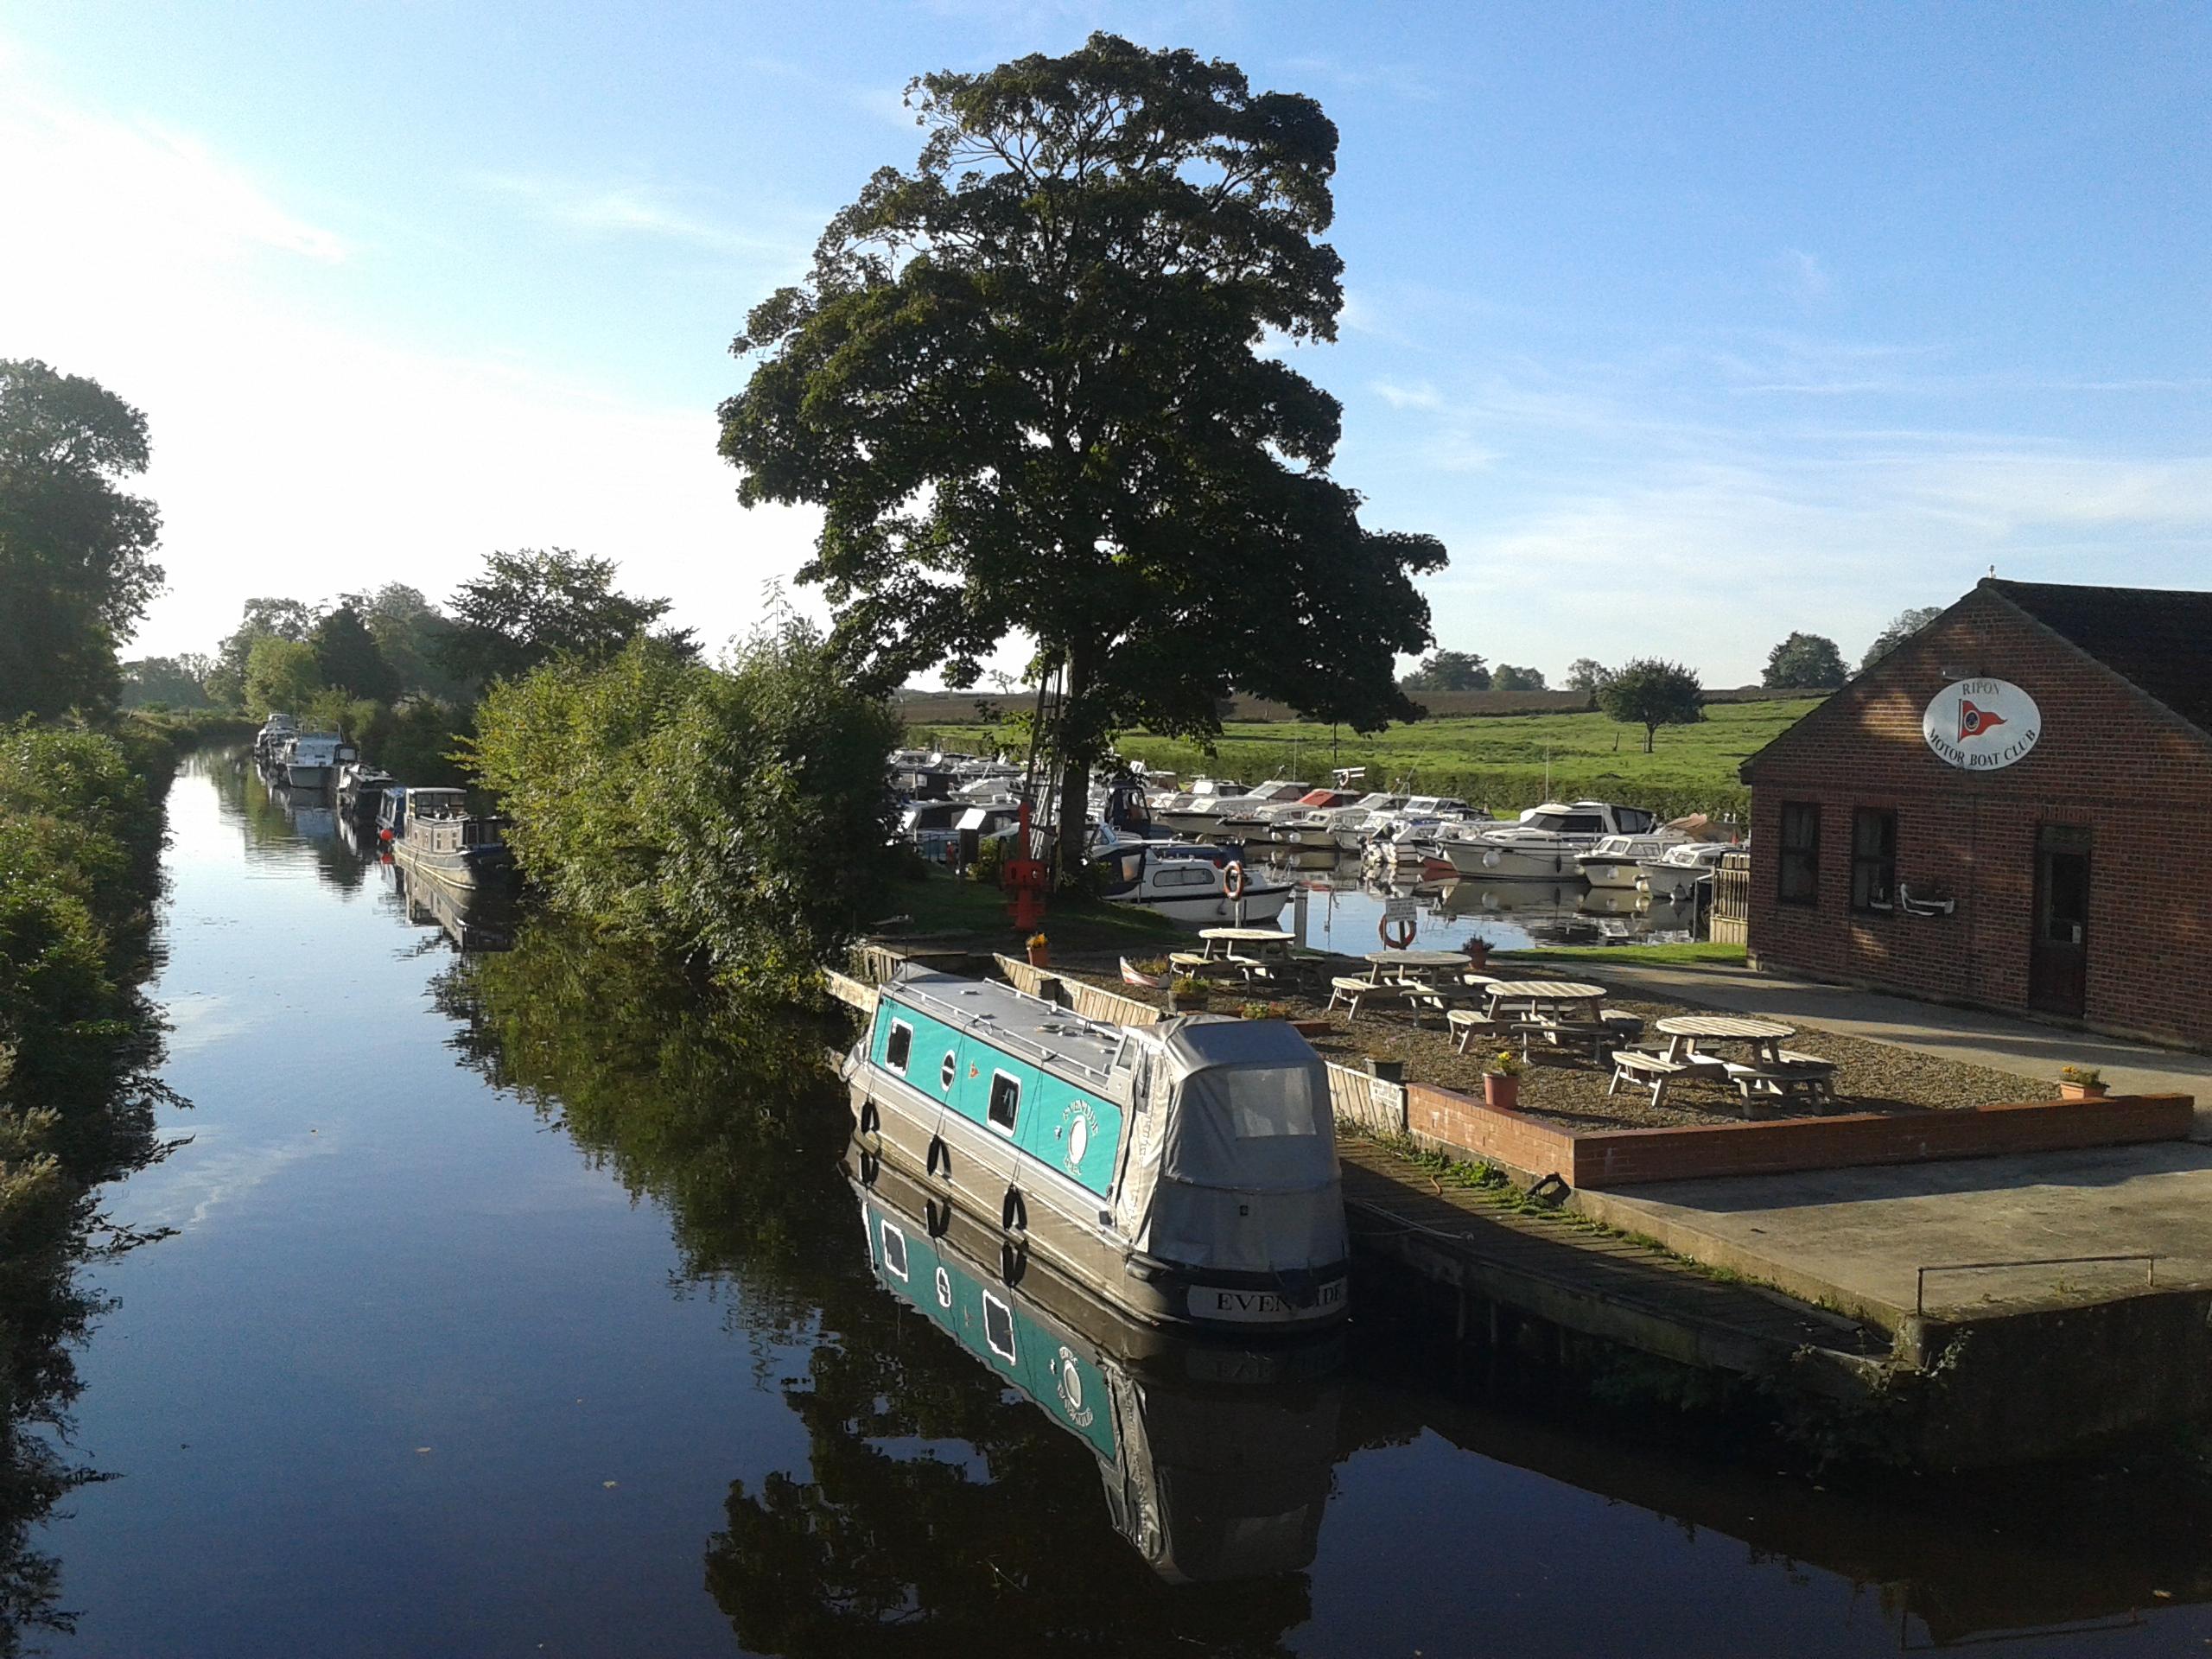 Canal flowing through Ripon